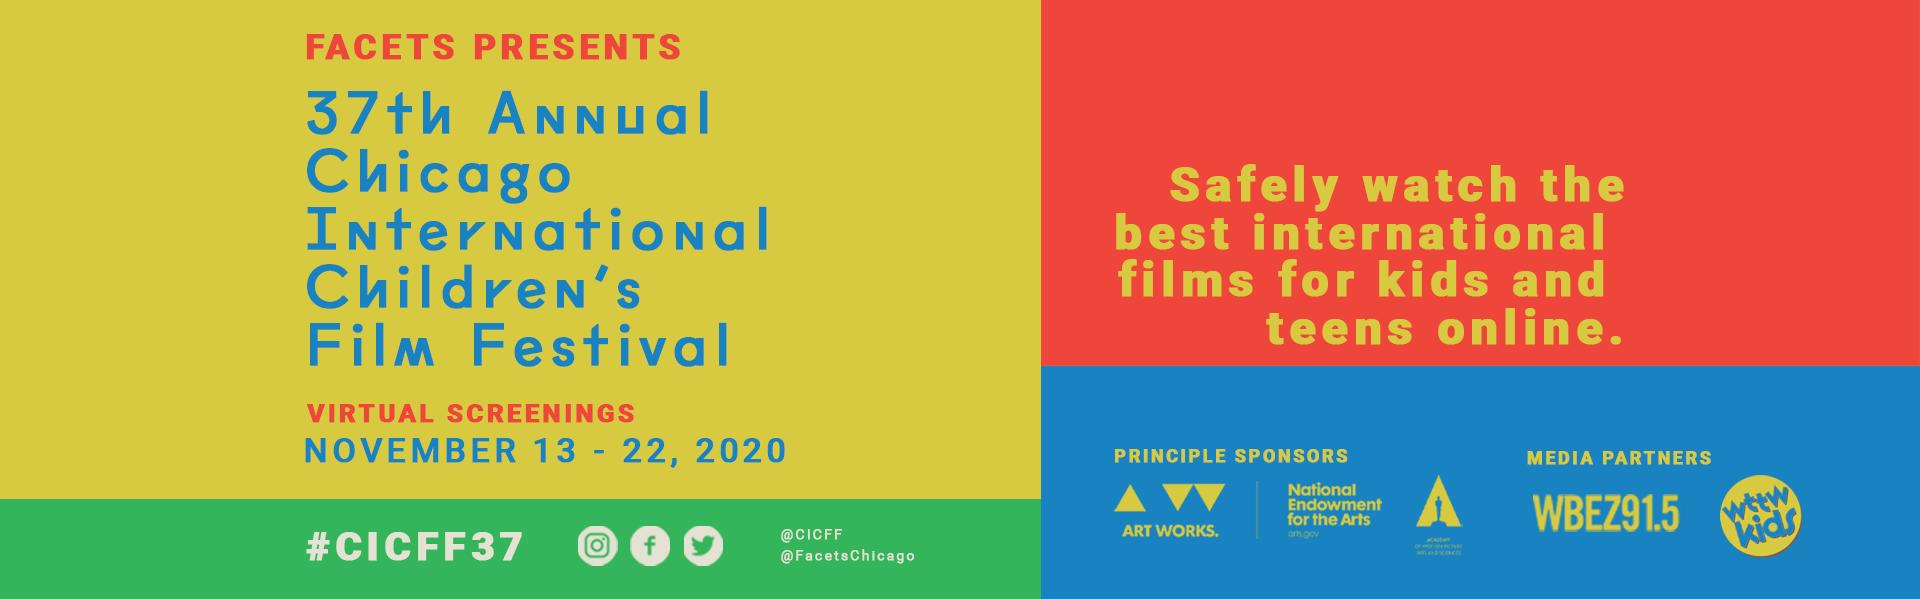 FACETS 37th Annual Chicago International Children's Film Festival